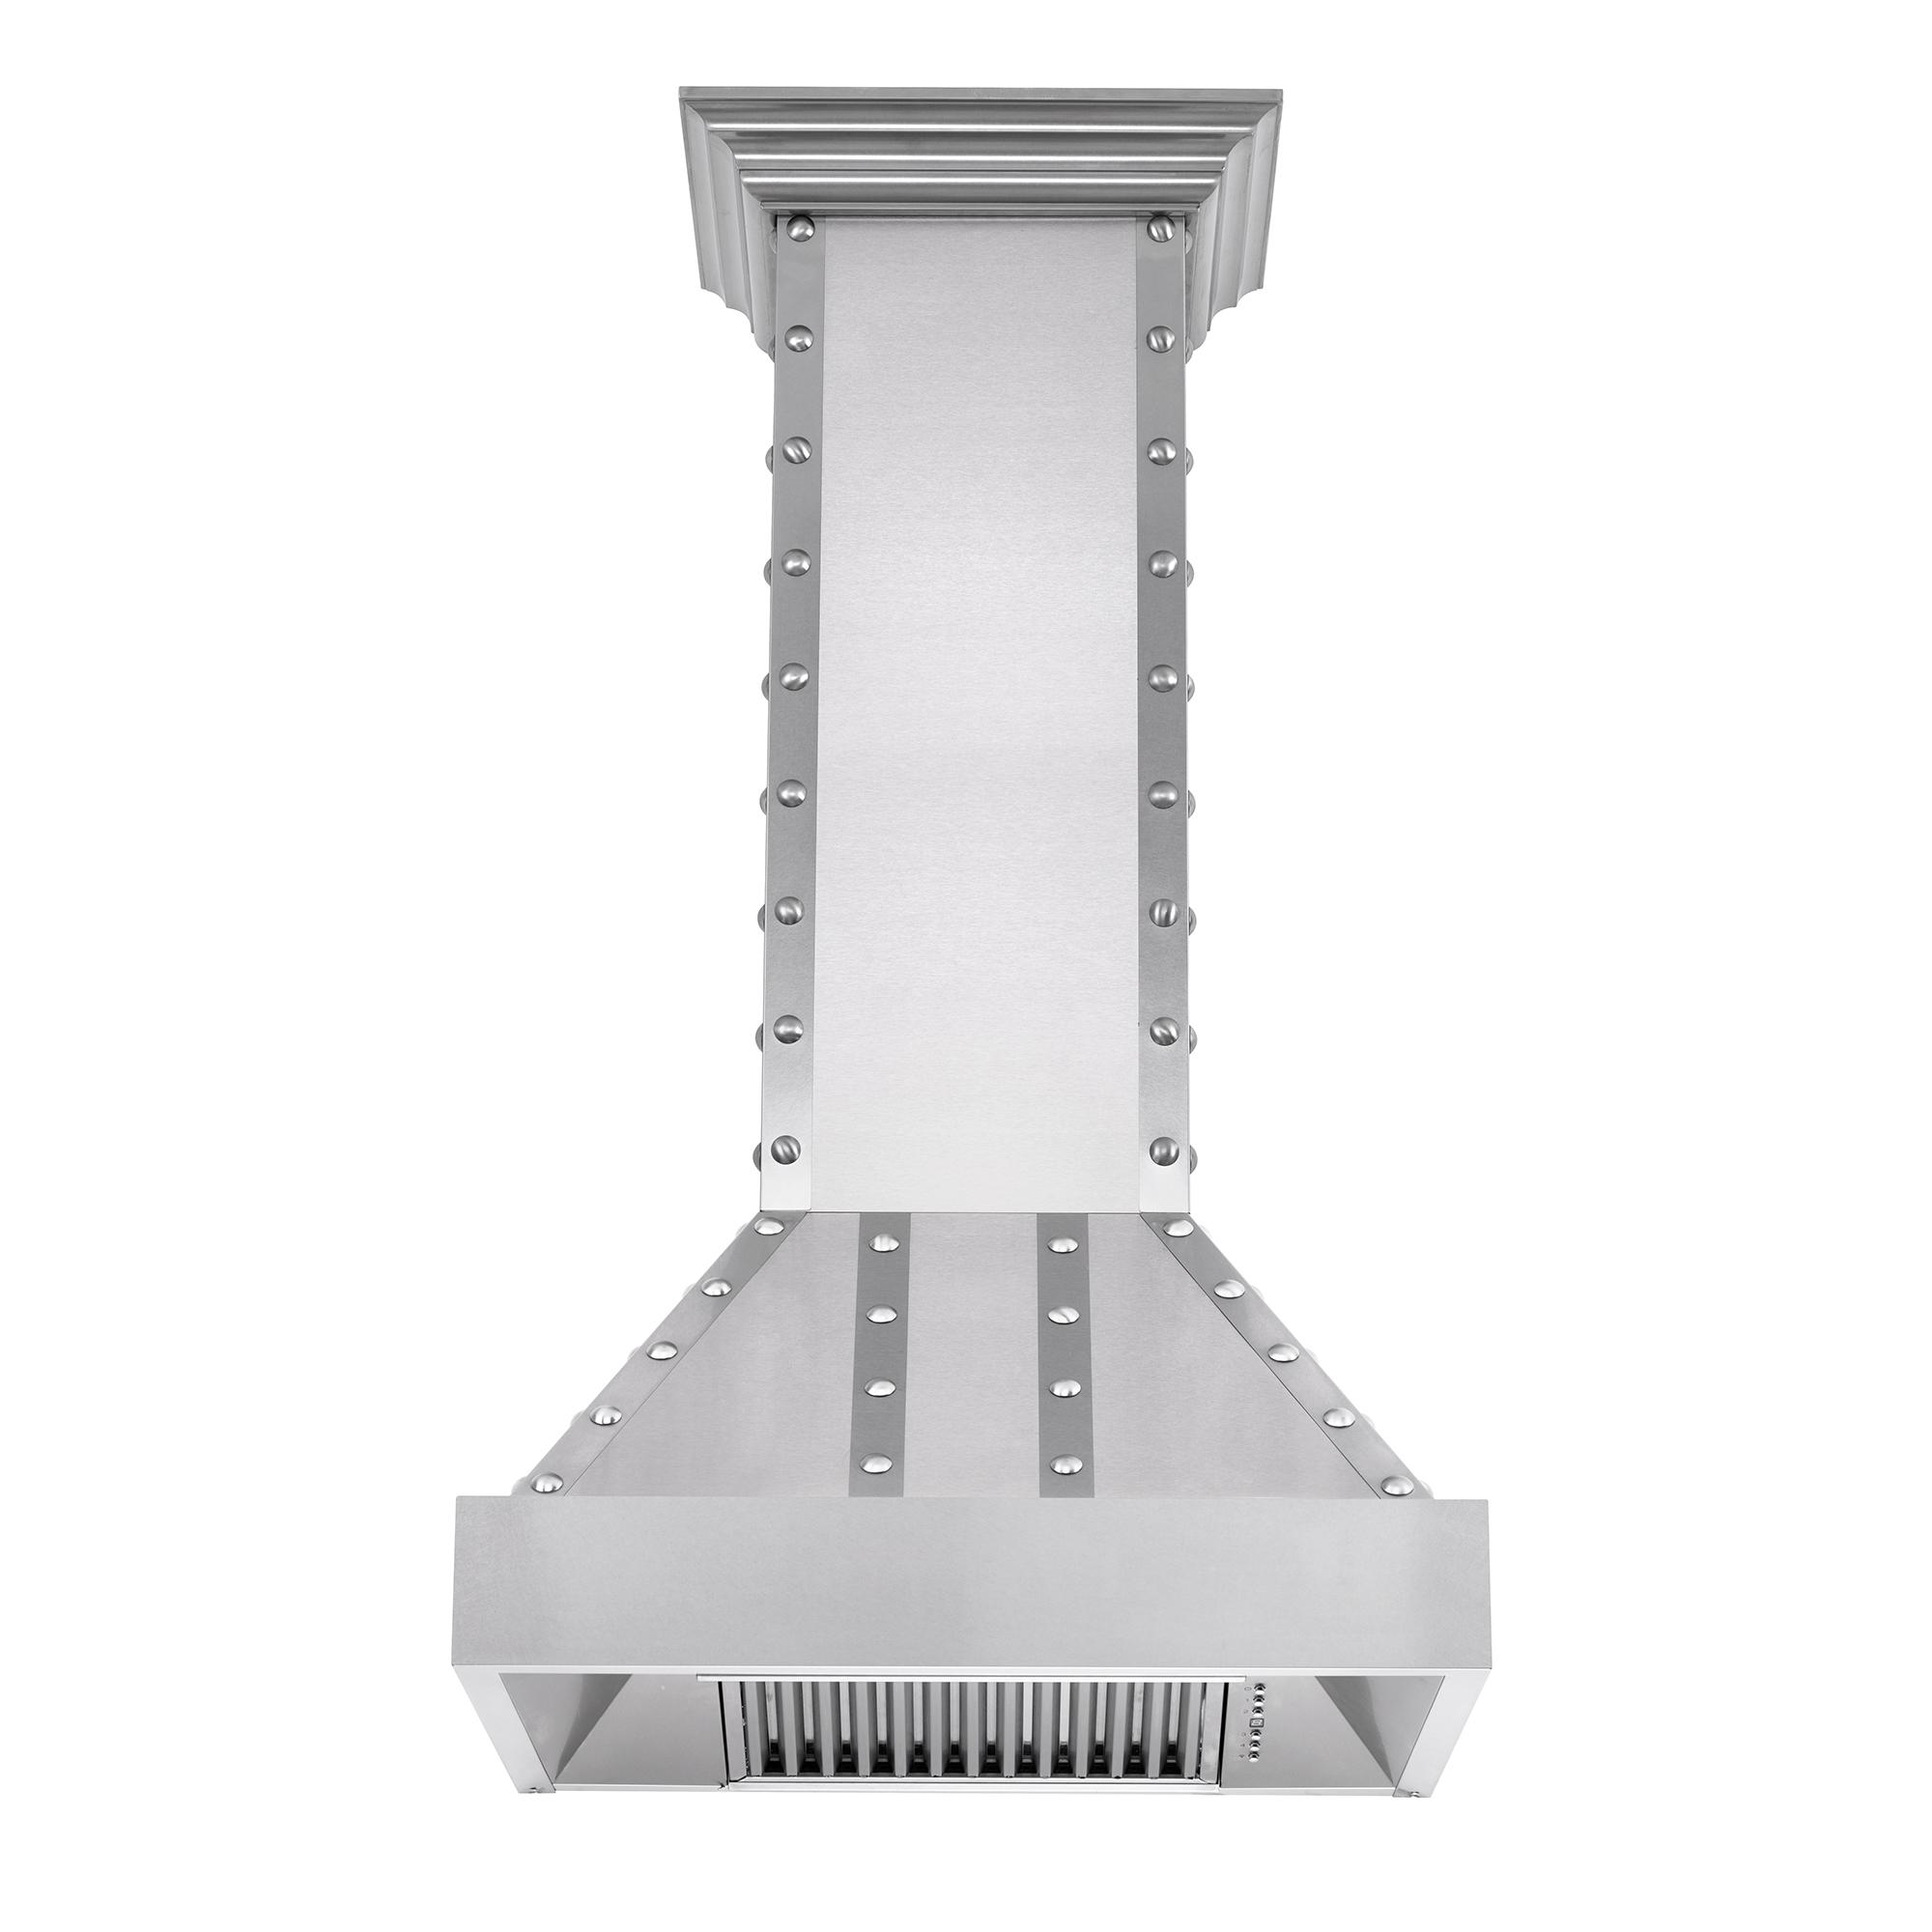 zline-stainless-steel-wall-mounted-range-hood-655-4SSSS-front-under.jpg